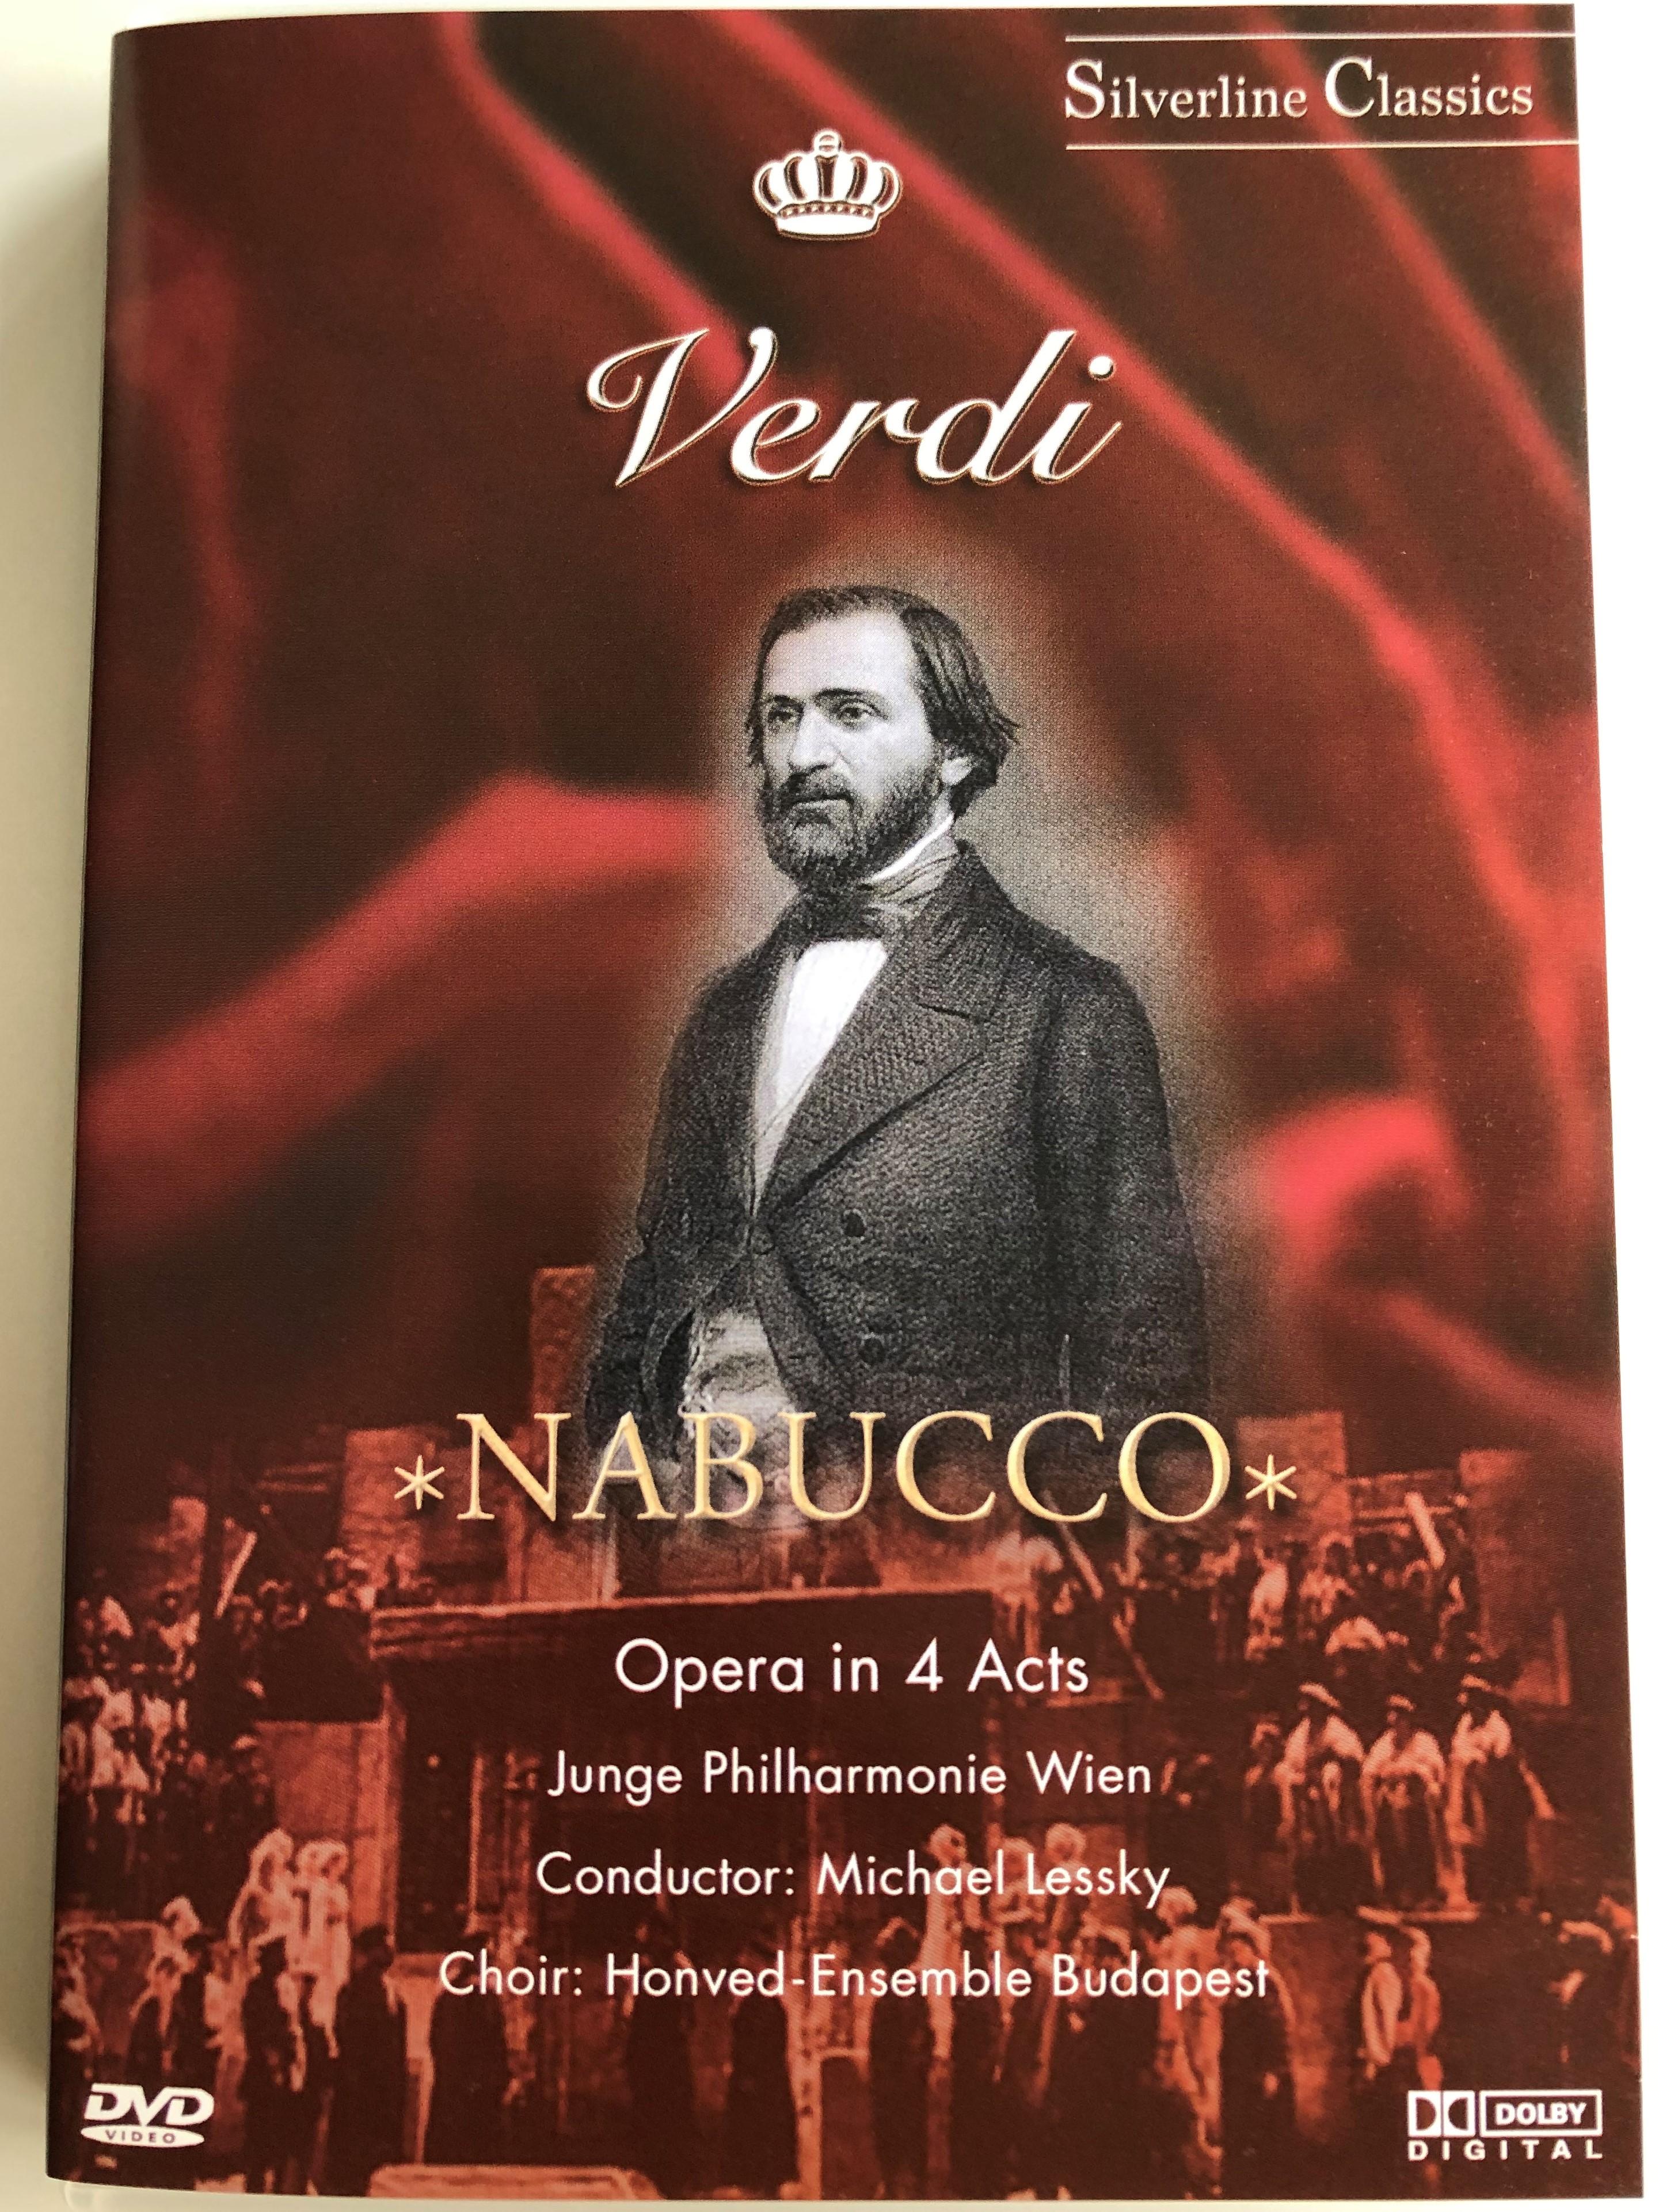 verdi-nabucco-dvd-2000-opera-in-4-acts-1.jpg